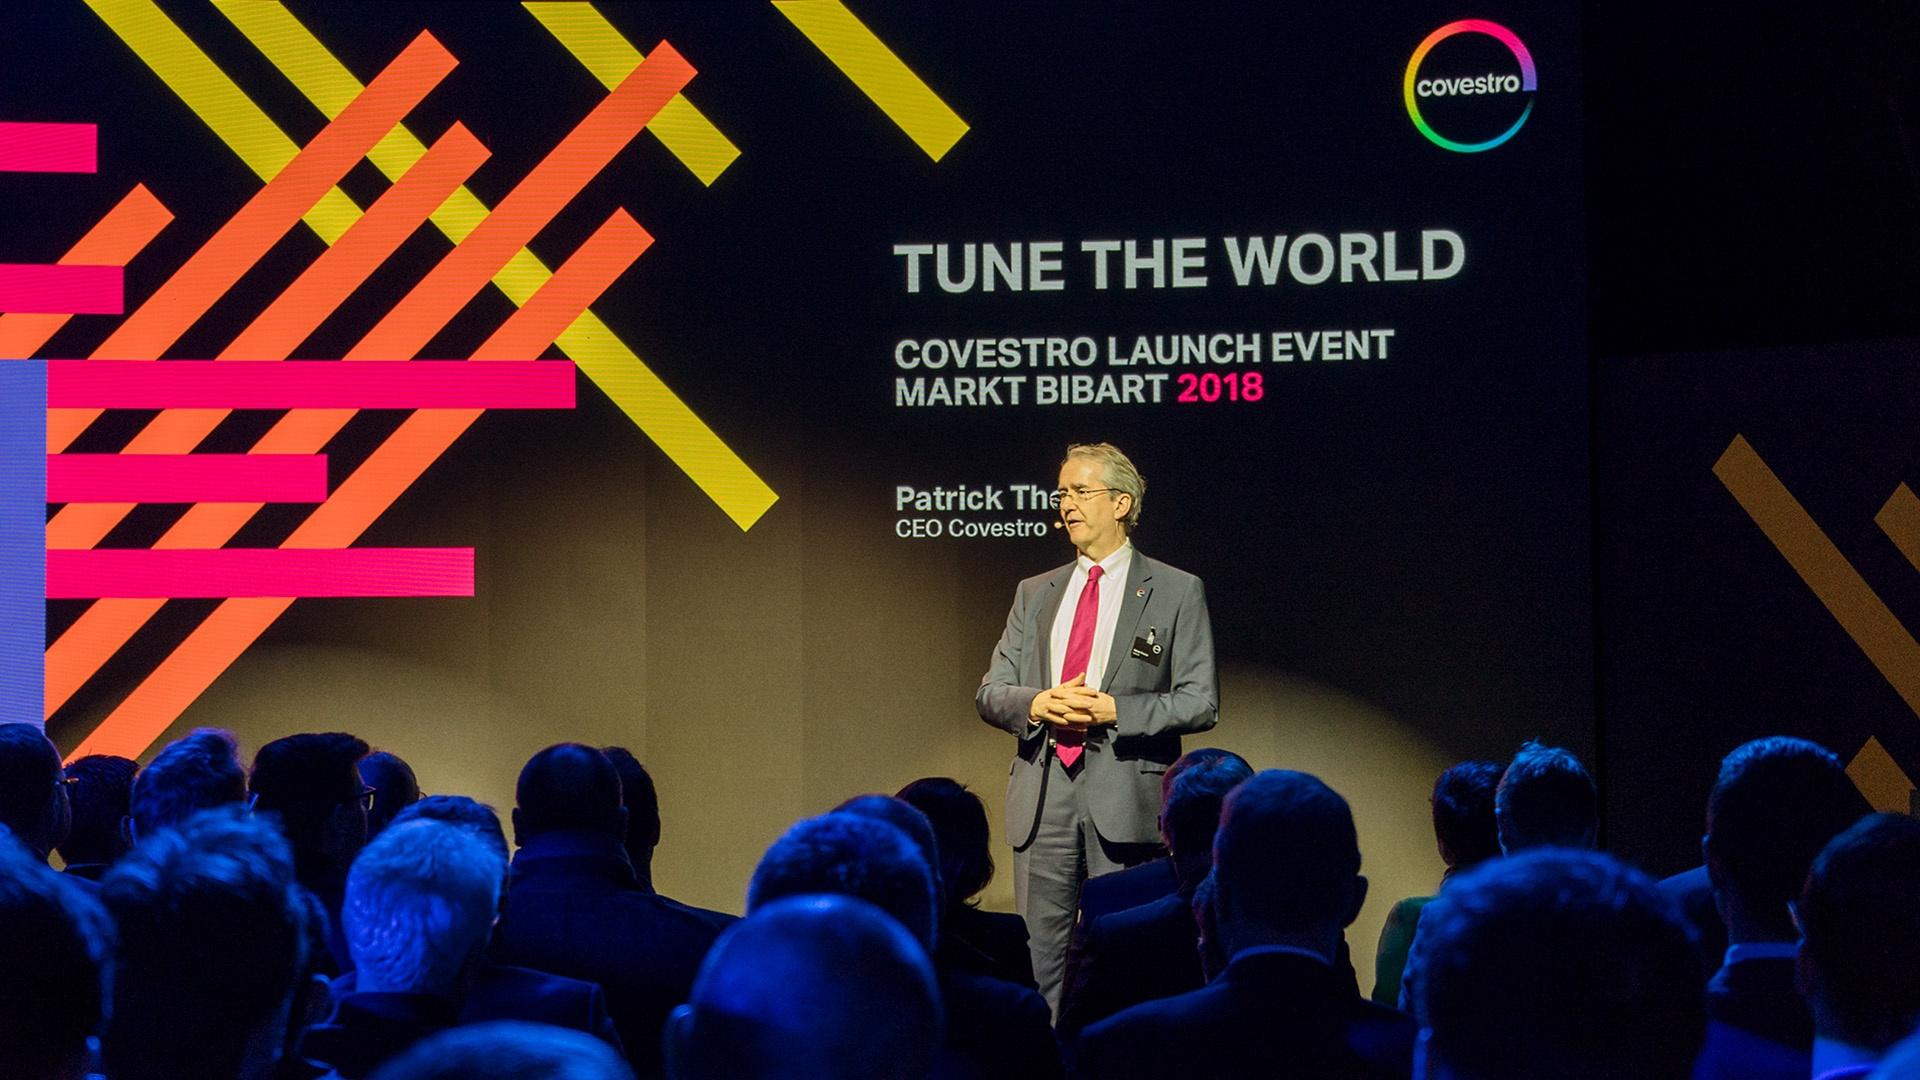 Covestro Launch Event Markt Bibart